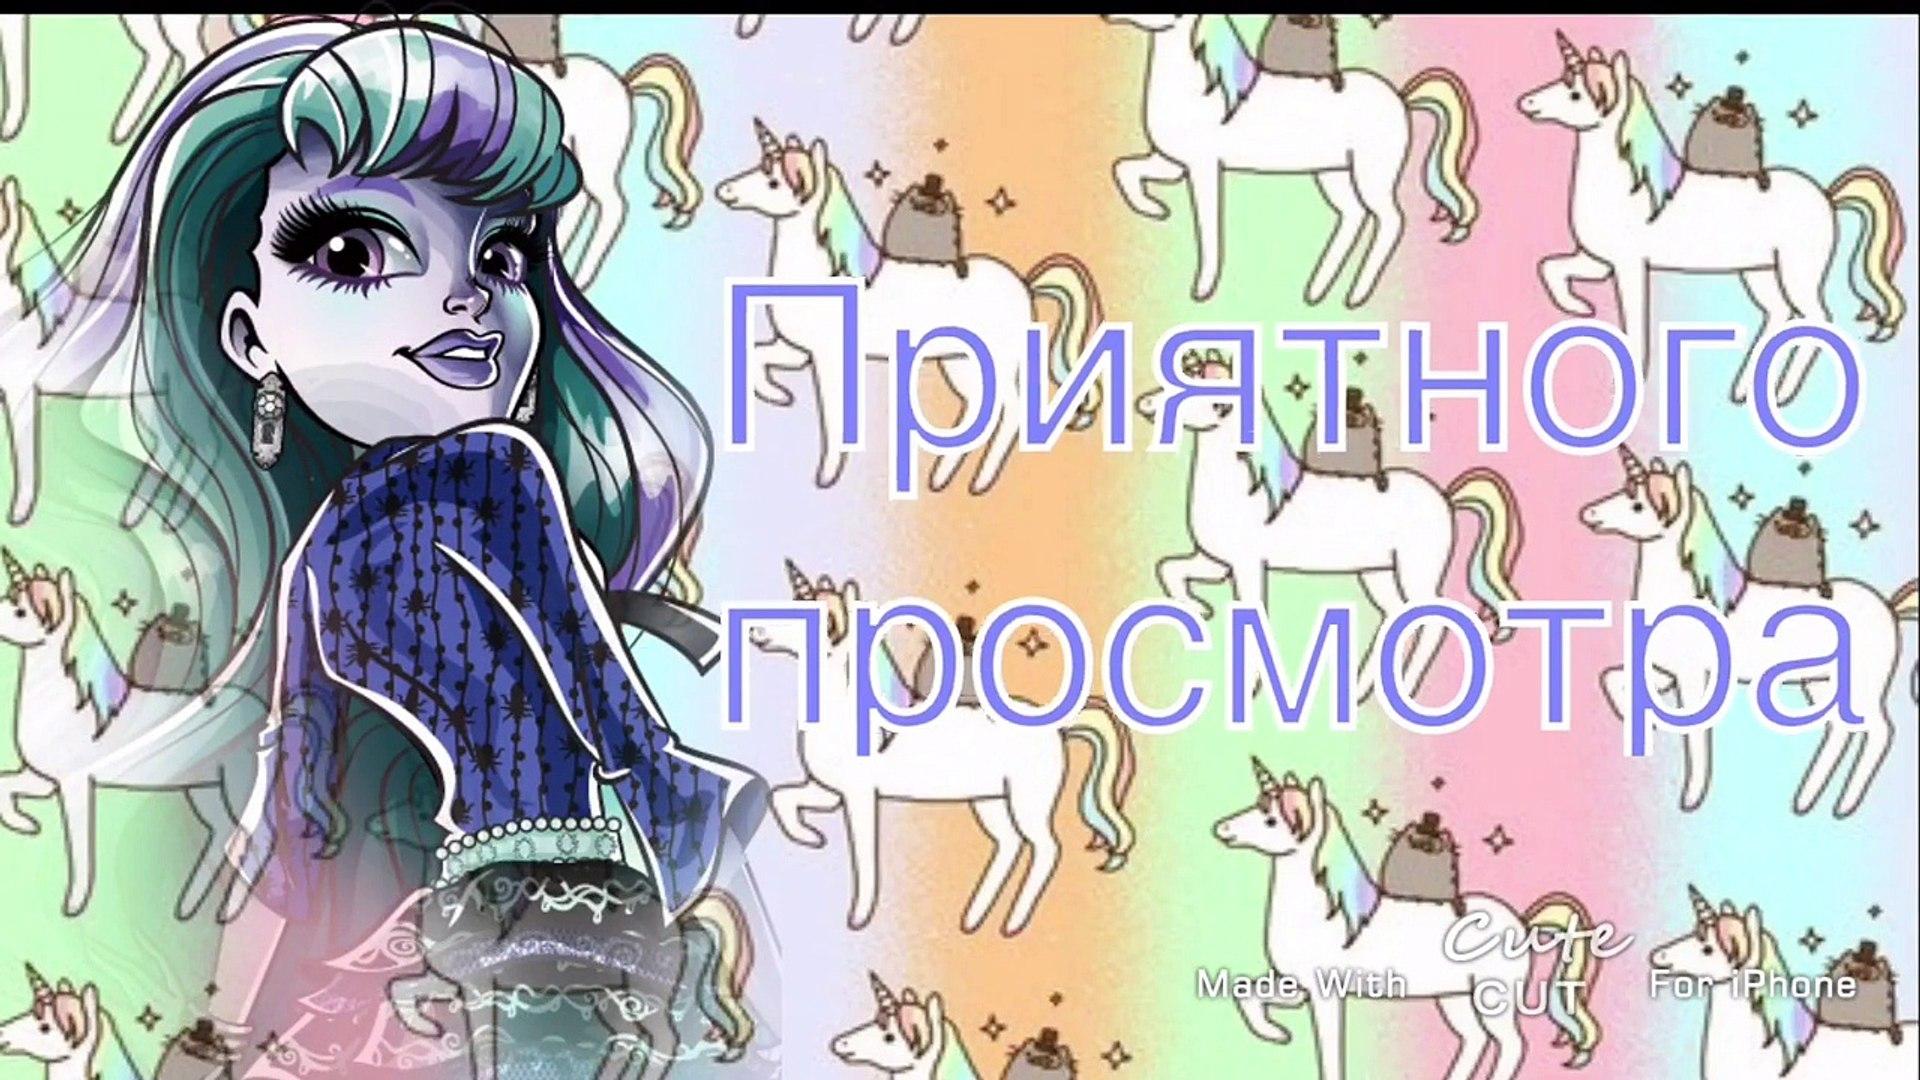 St.M. На конкурс от канала Polina FarGo  Конец учебного года 2016